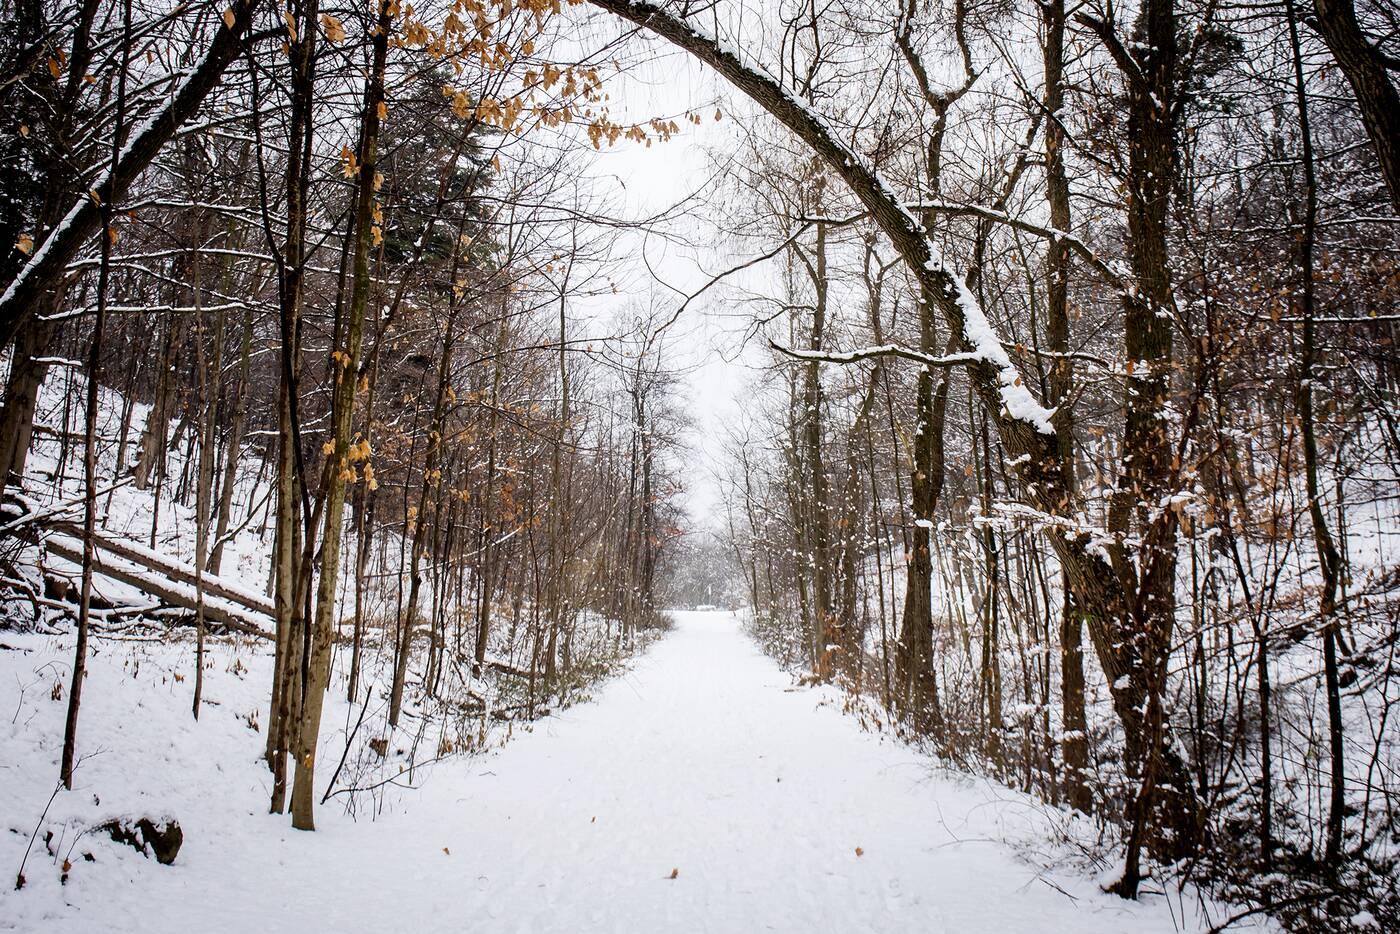 doris mccarthy trail